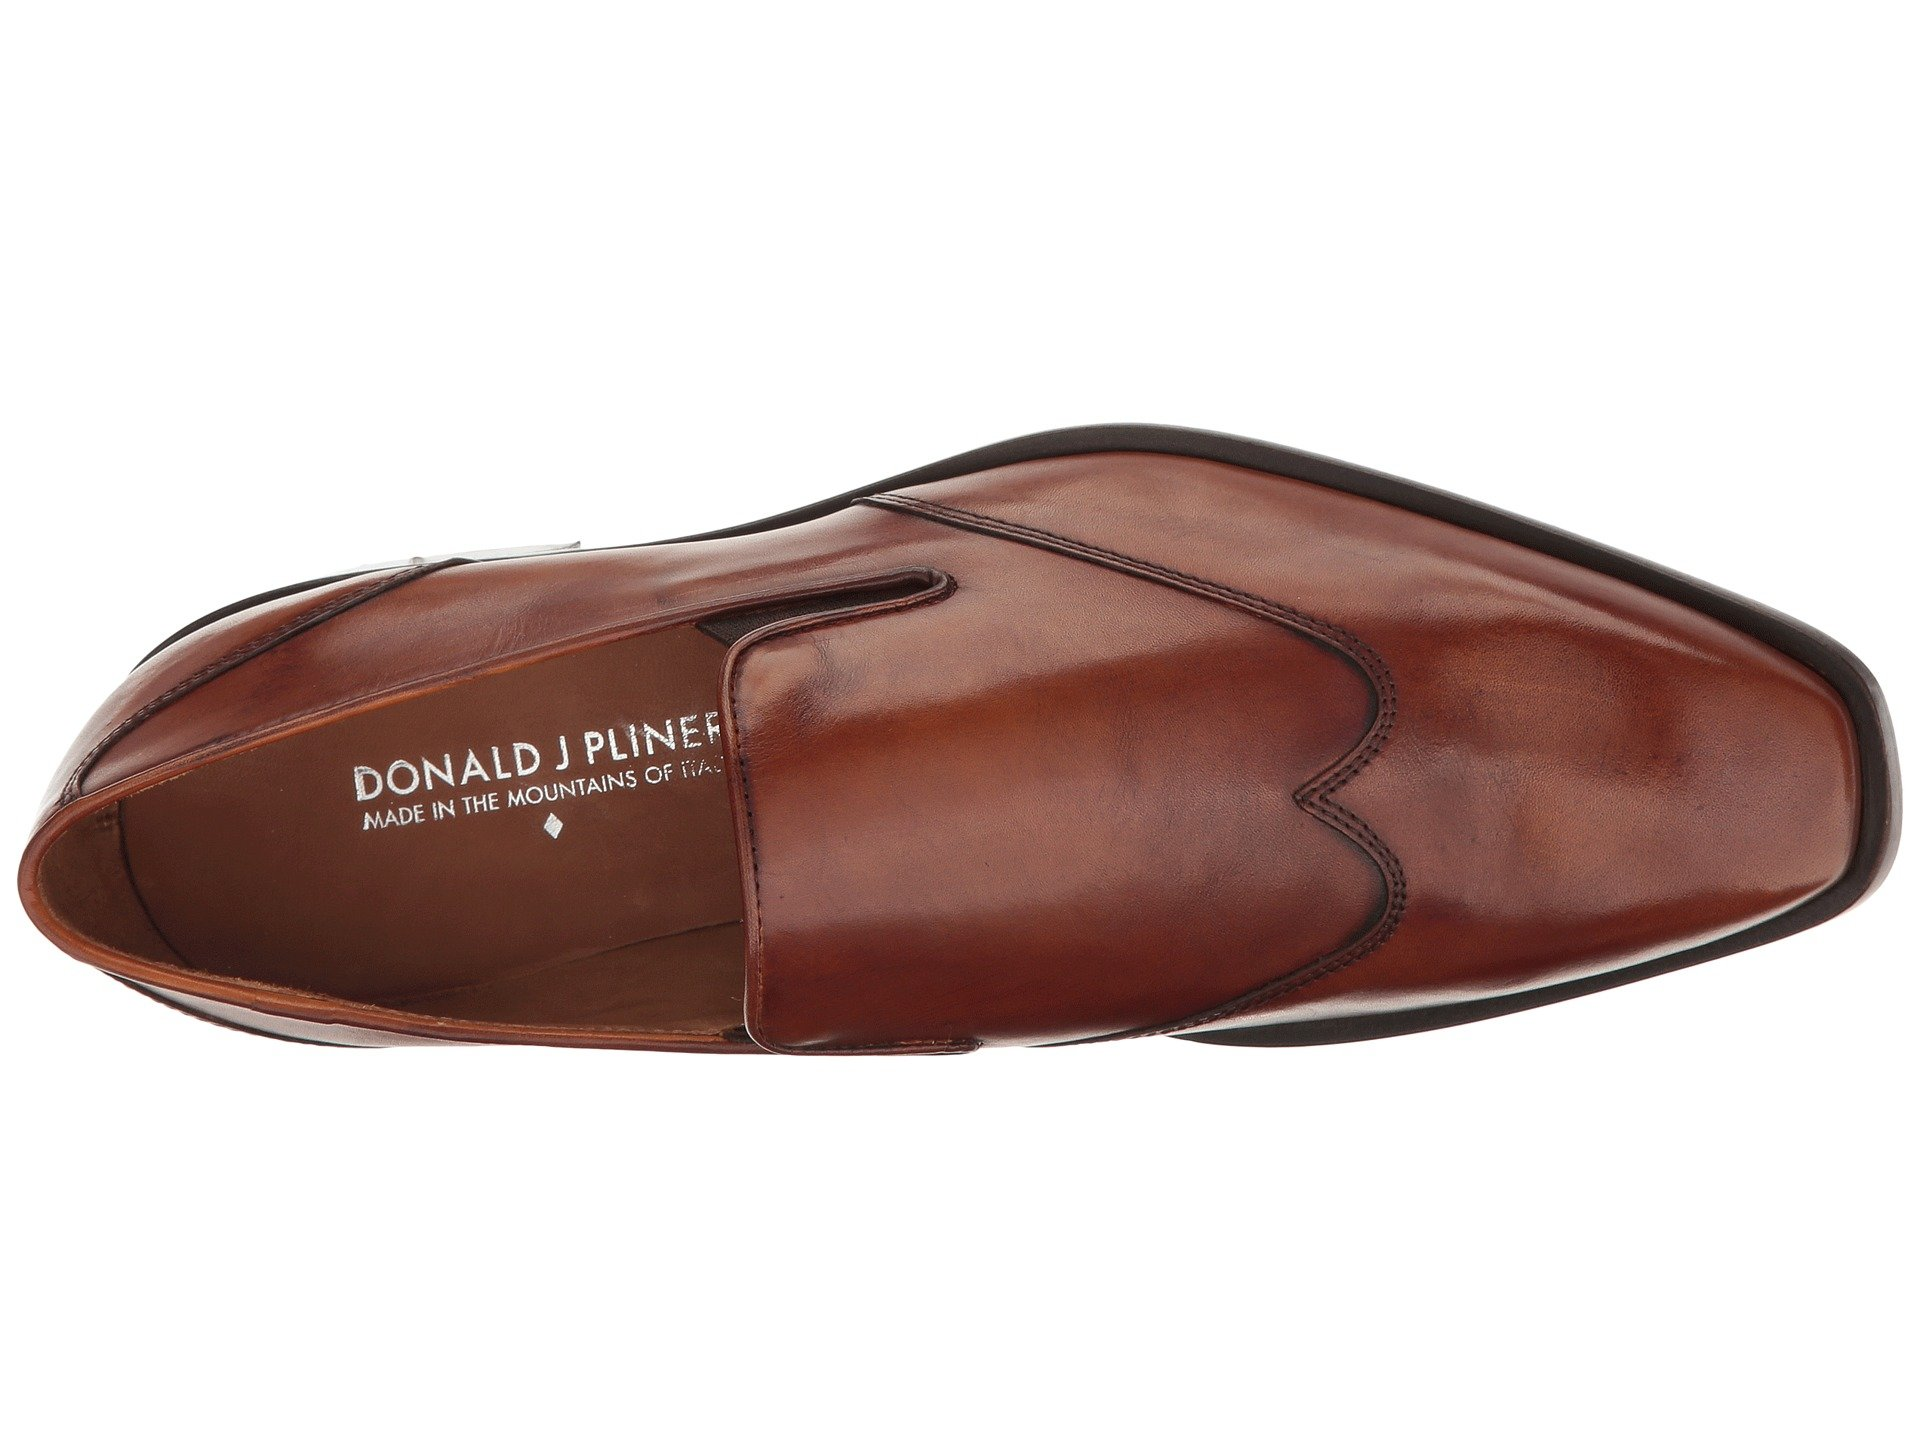 Donald Saddle Valente J J Donald Pliner xwgR4q41F